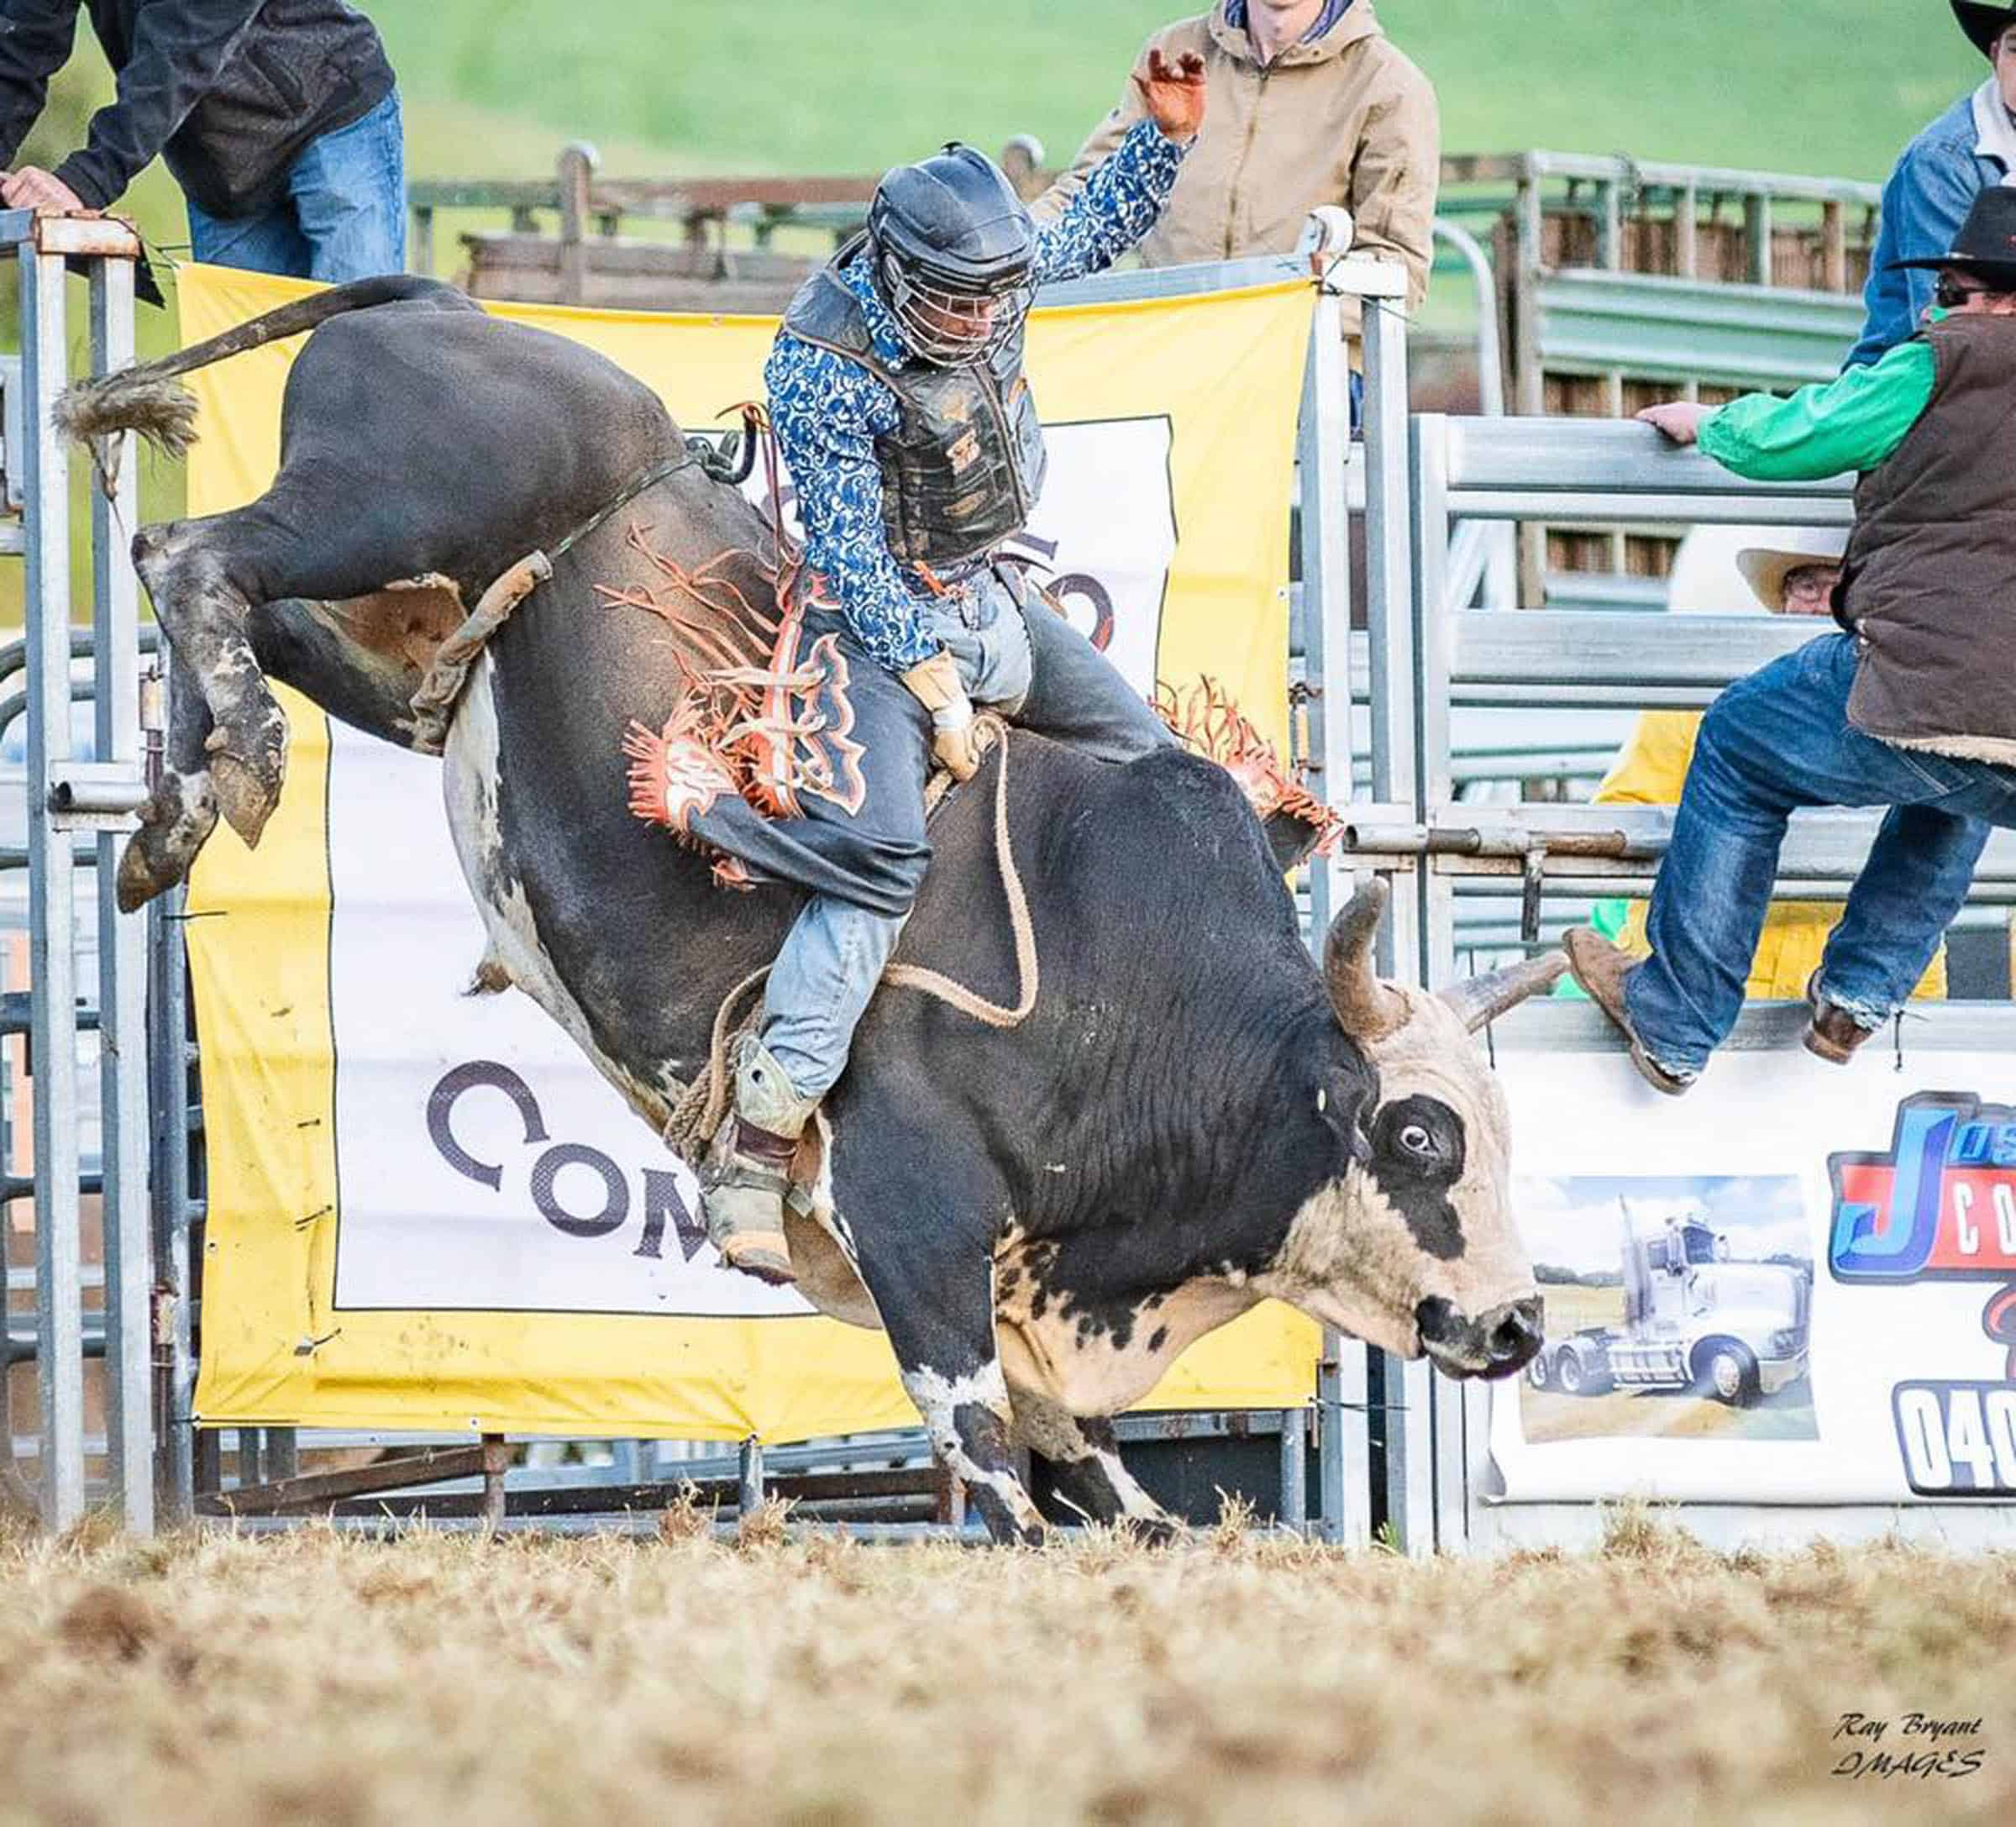 Wynyard Rodeo Committee